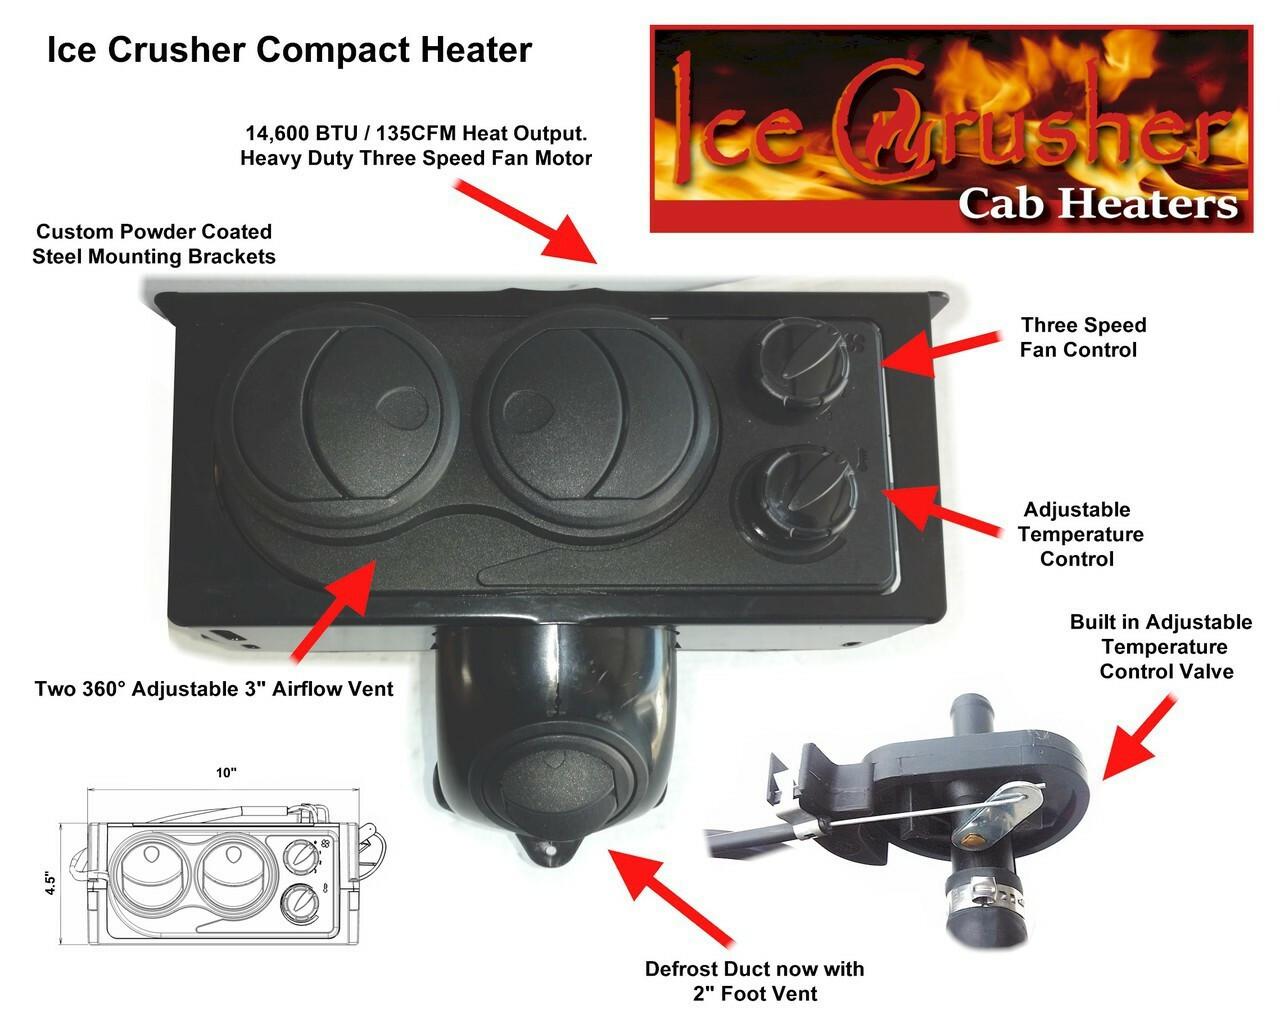 Ice Crusher Compact Polaris Ranger Midsize 2010-2014 400/500/570/800 and Midsize 500/800 Crew Cab Heater Kit